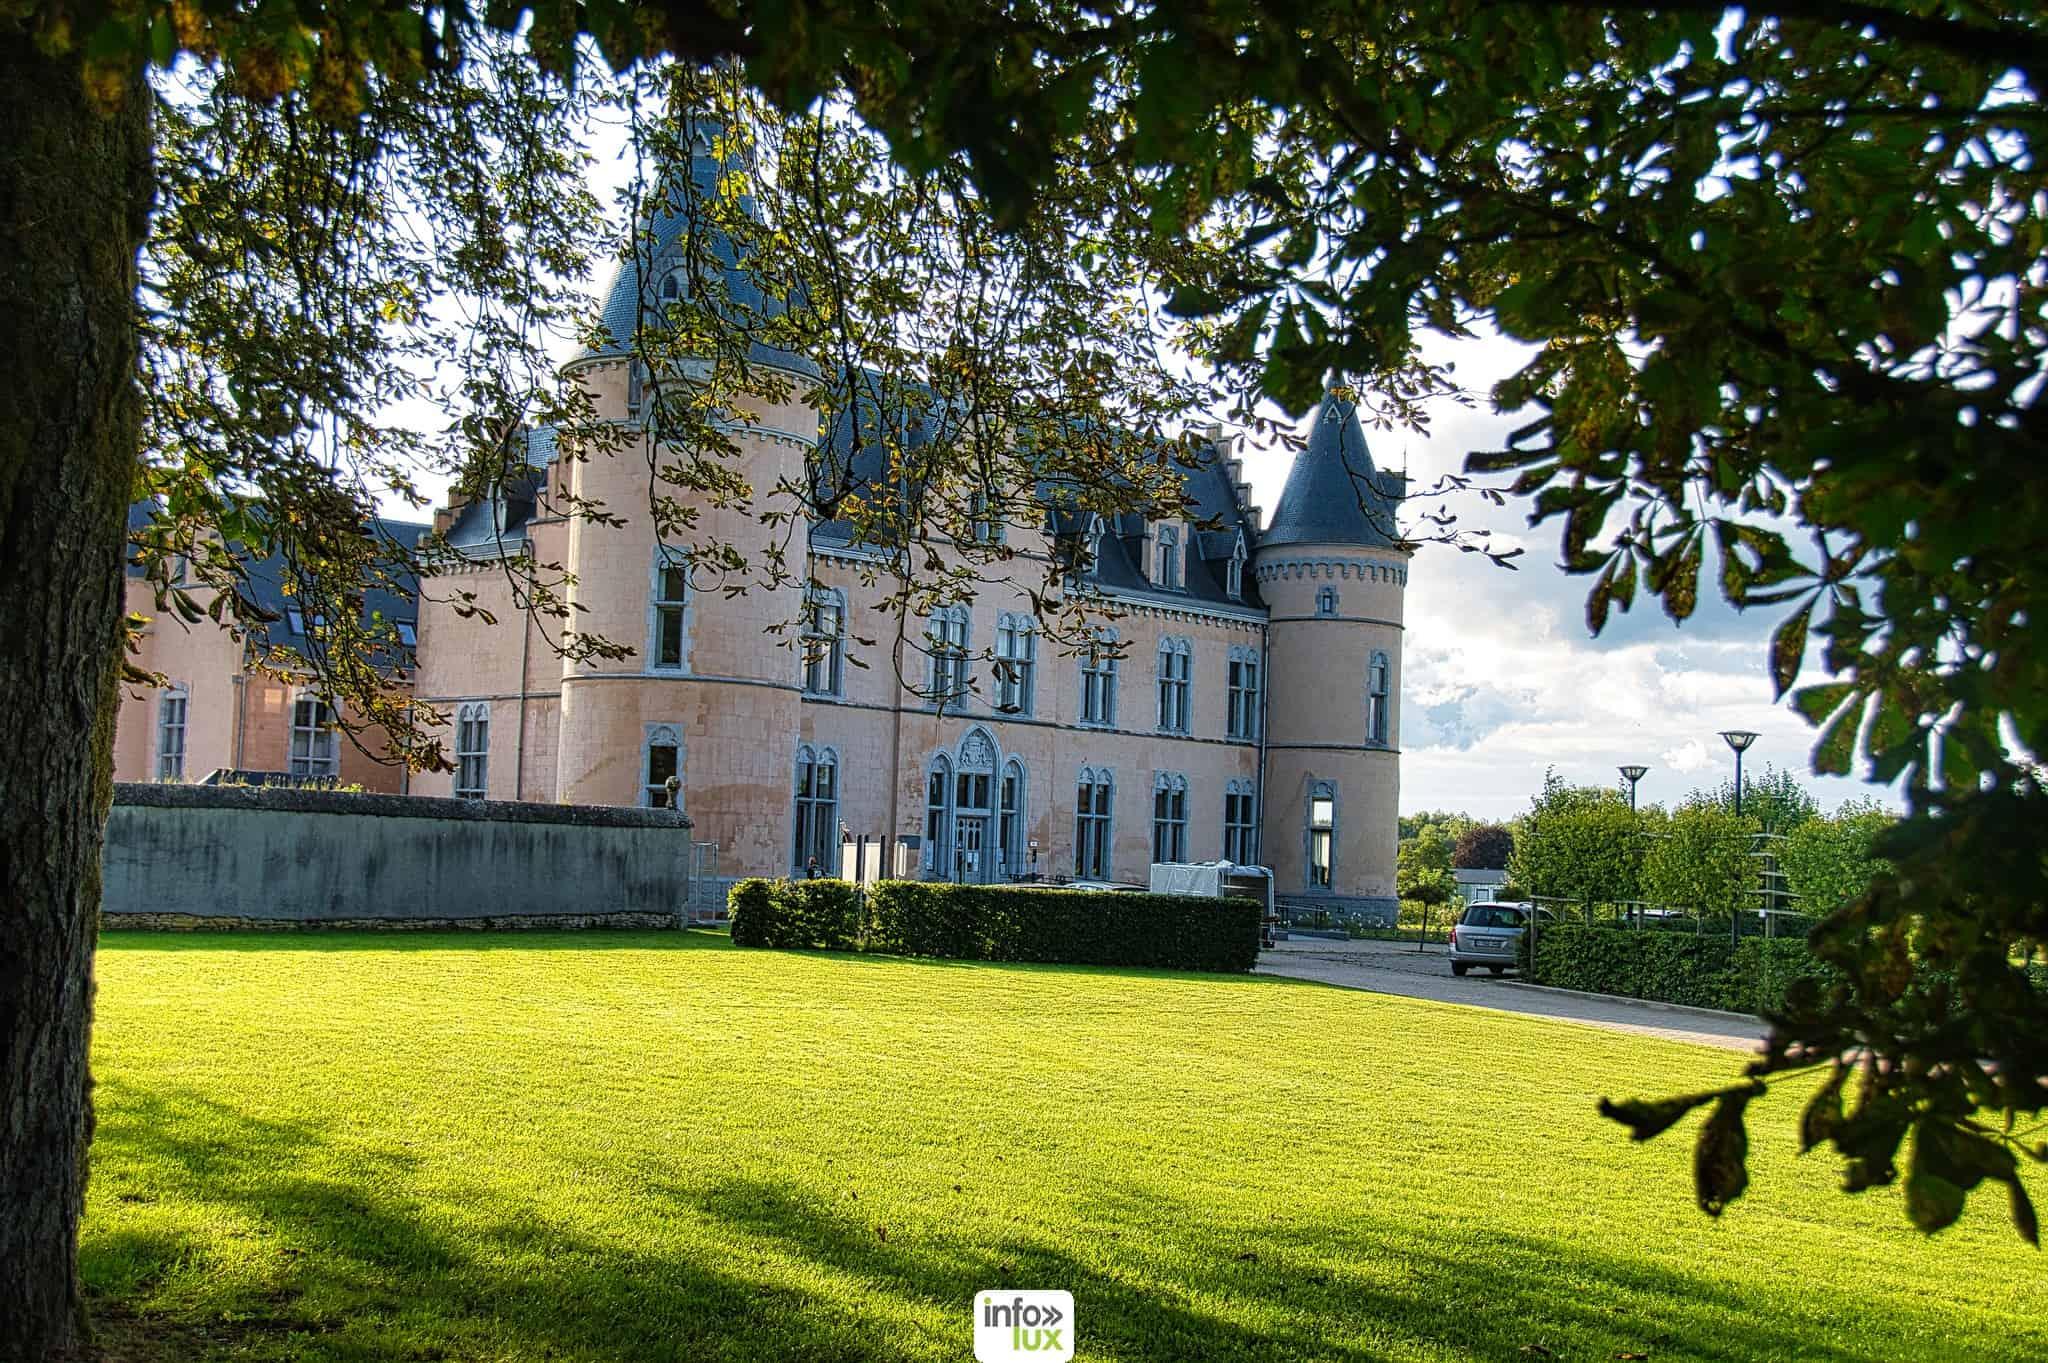 Chateau du faing